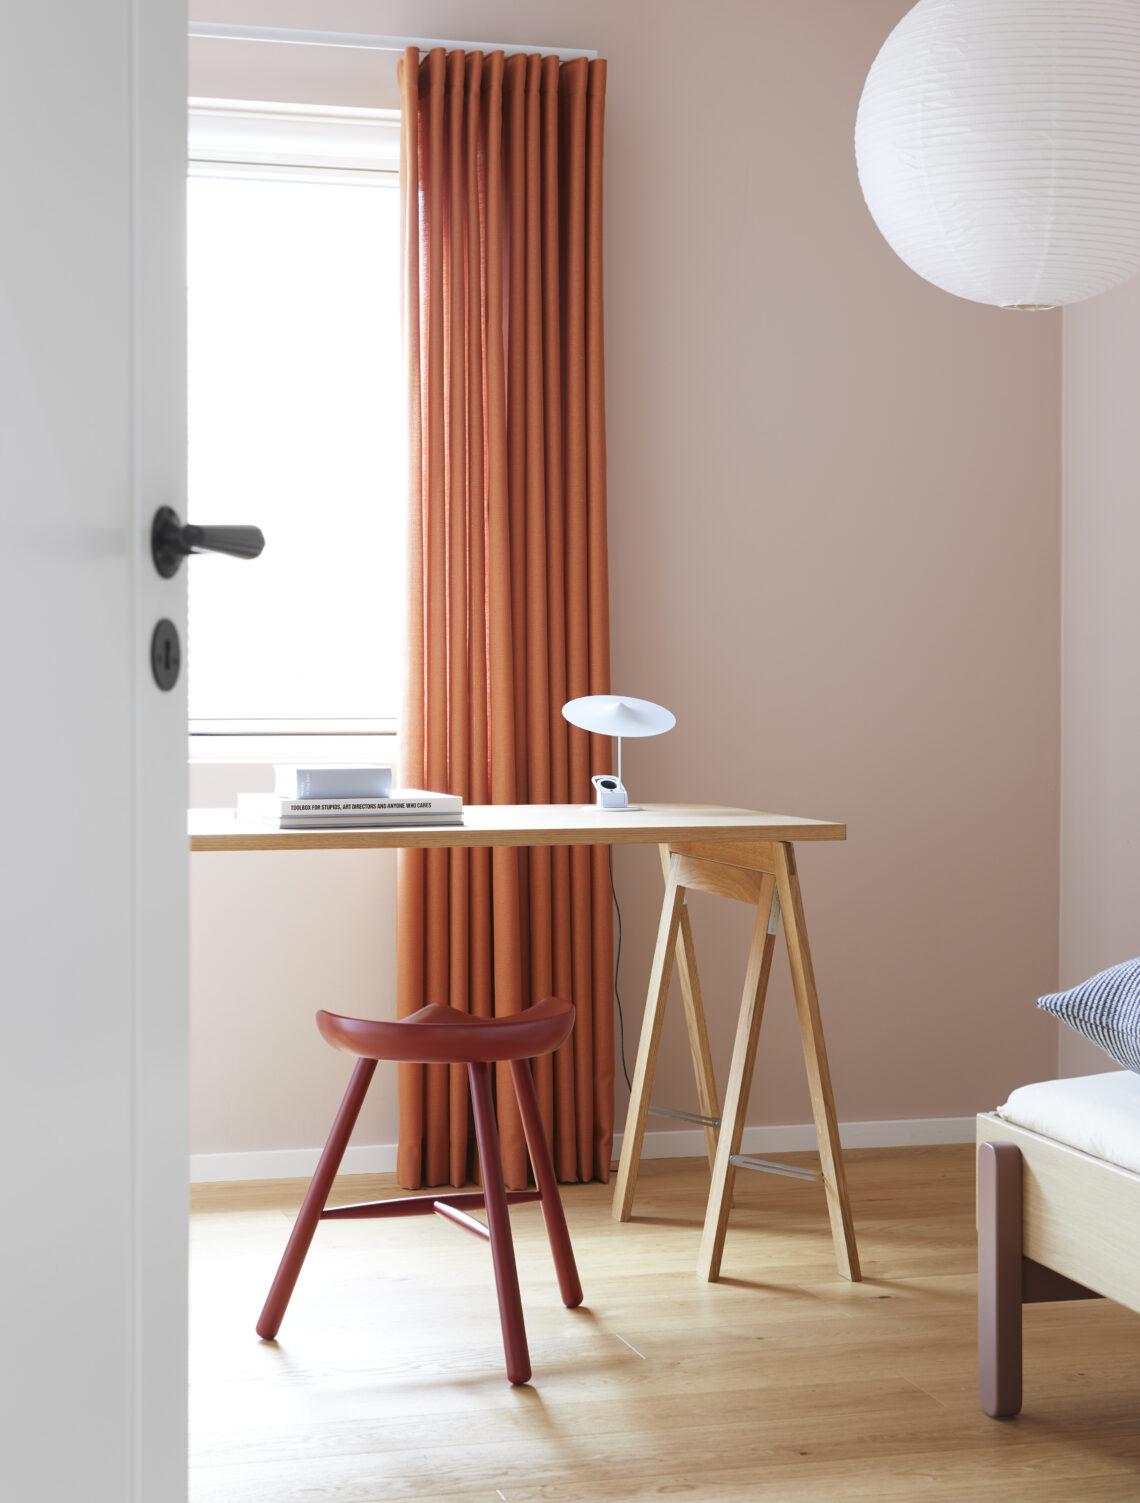 Form & Refine schoemaker chair 49 rood krukje